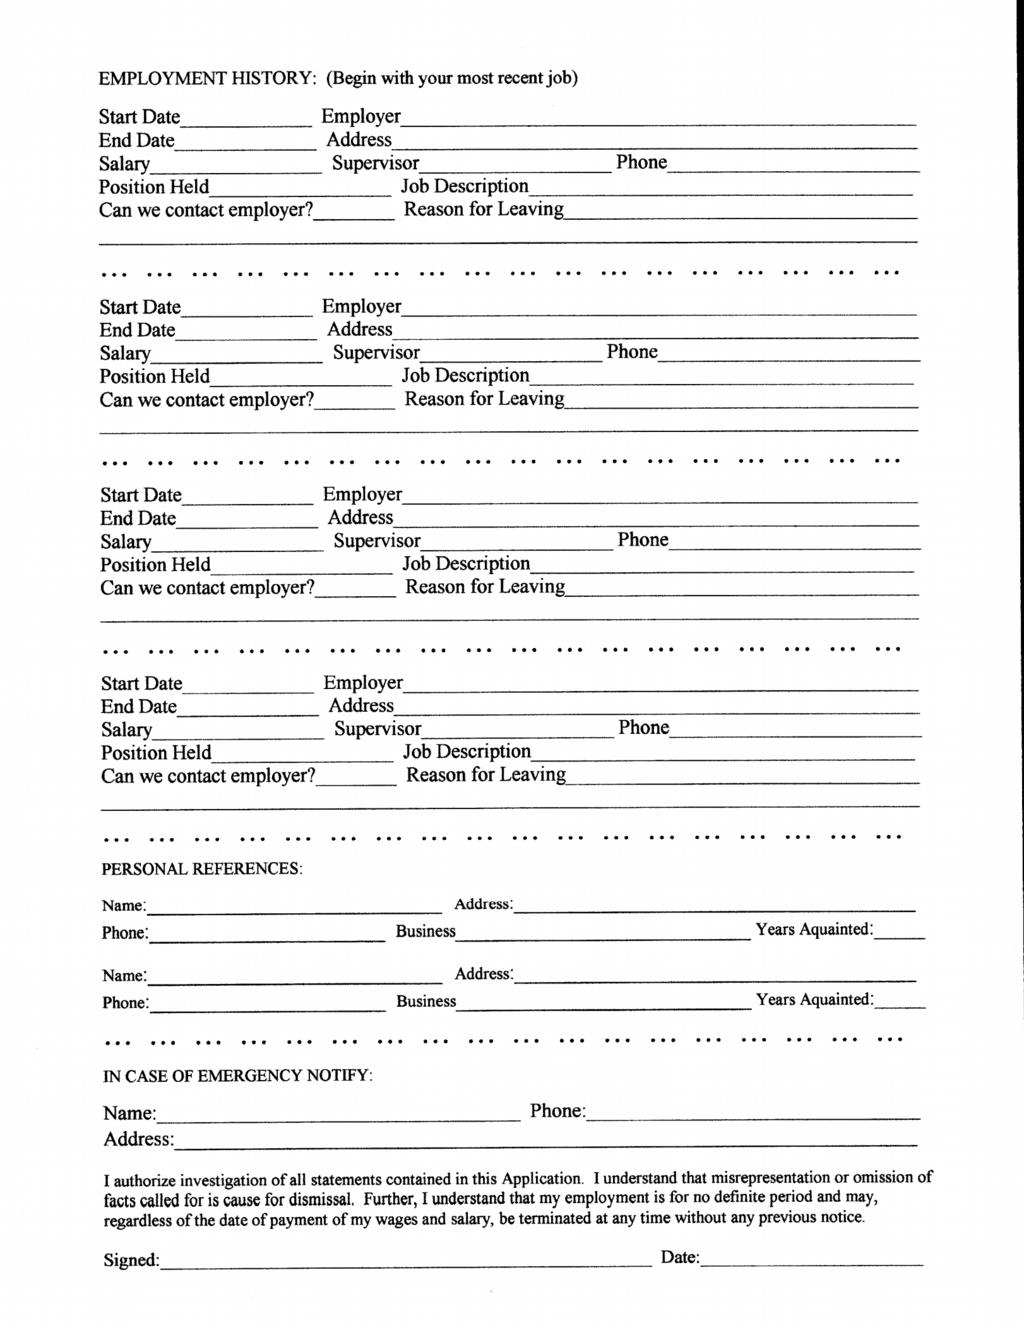 silver safari spokane valley mall application back page